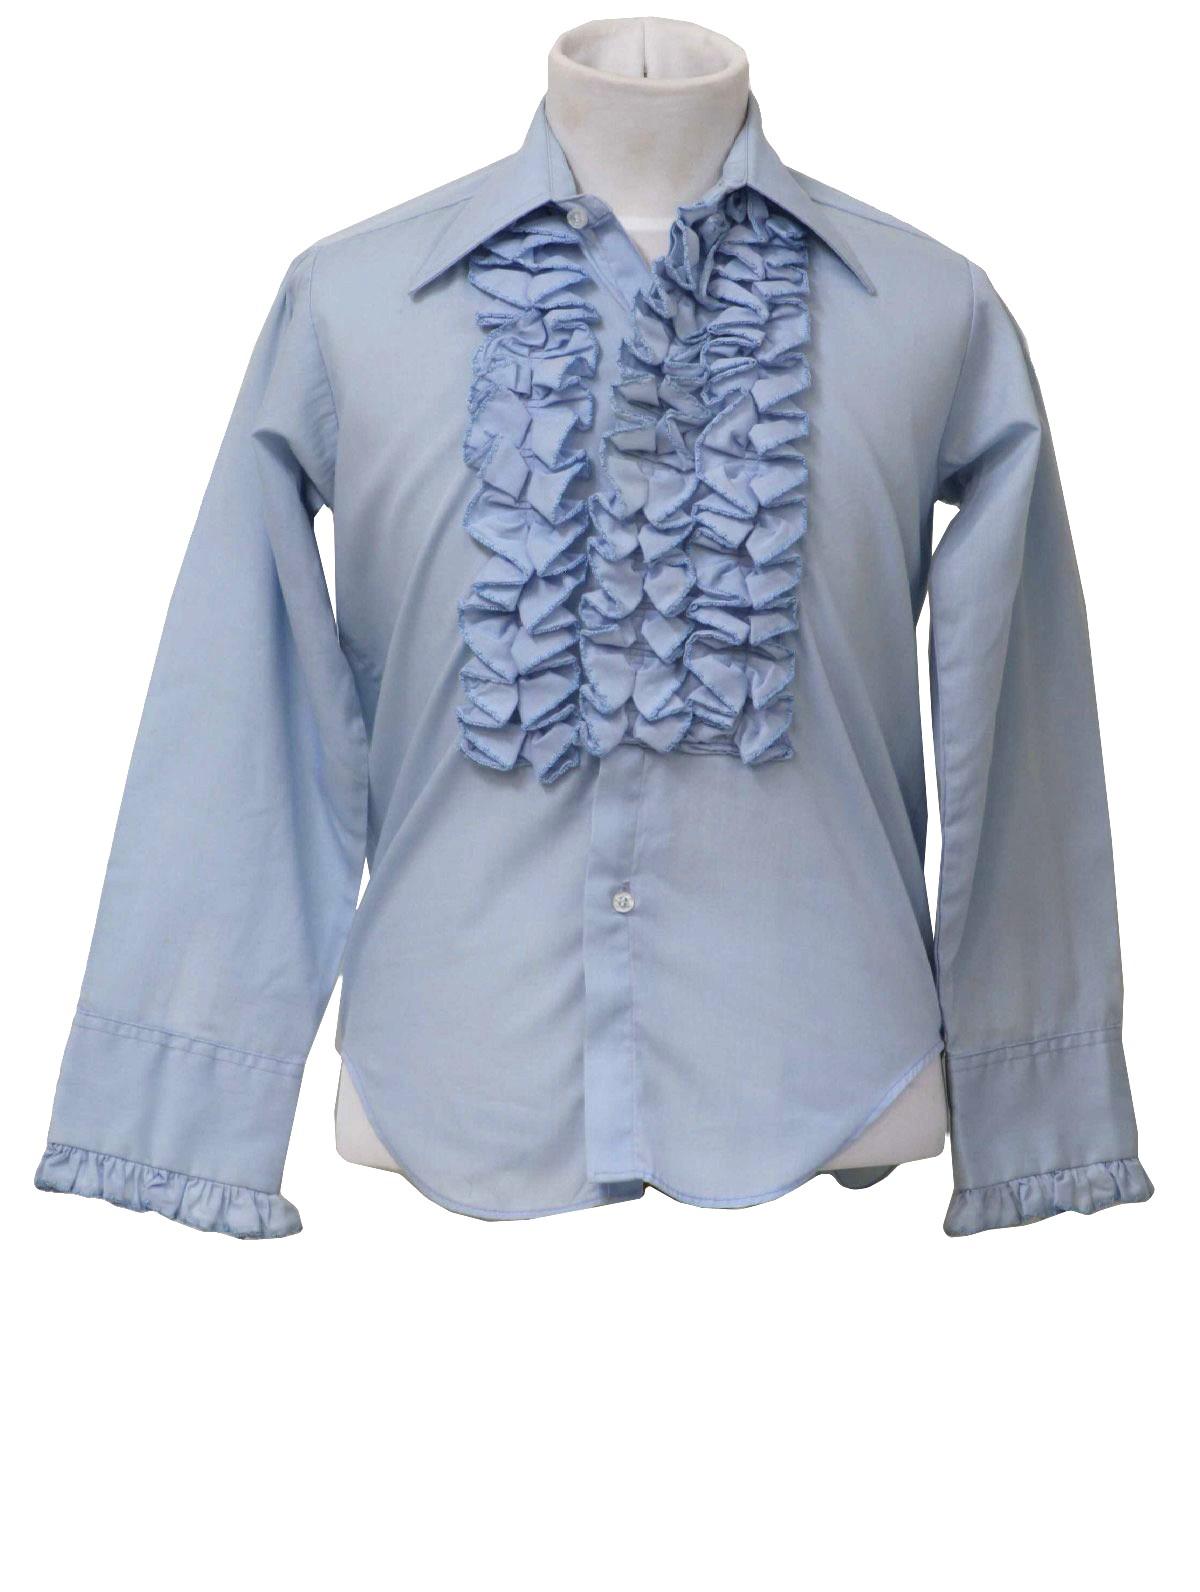 Retro Seventies Shirt 70s After Six Little Boys Toddler